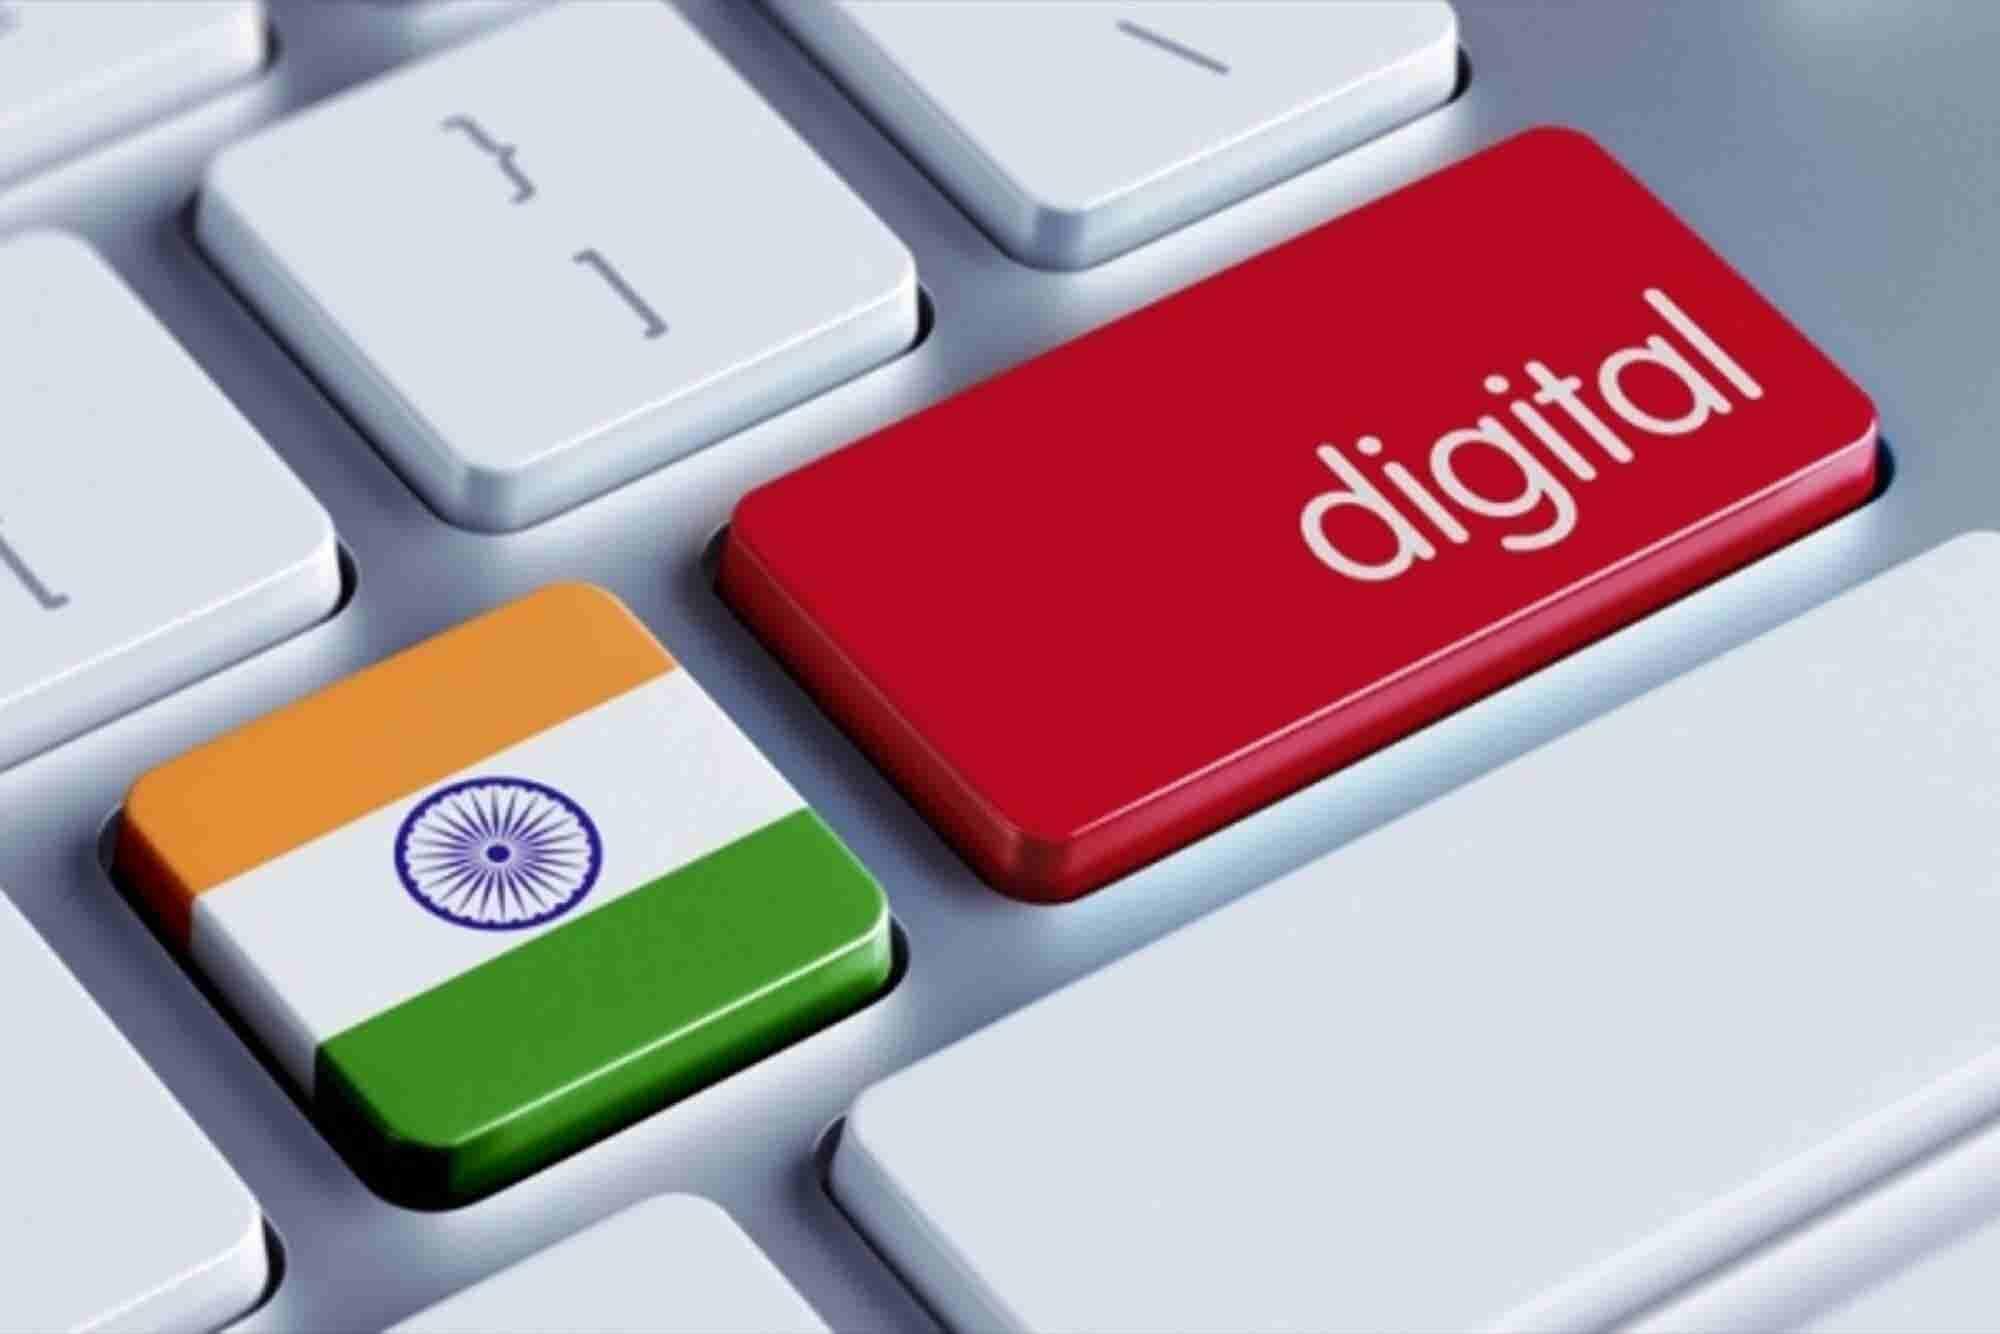 Former Indian PM Manmohan Singh Says Demonetization Will Hurt SMEs